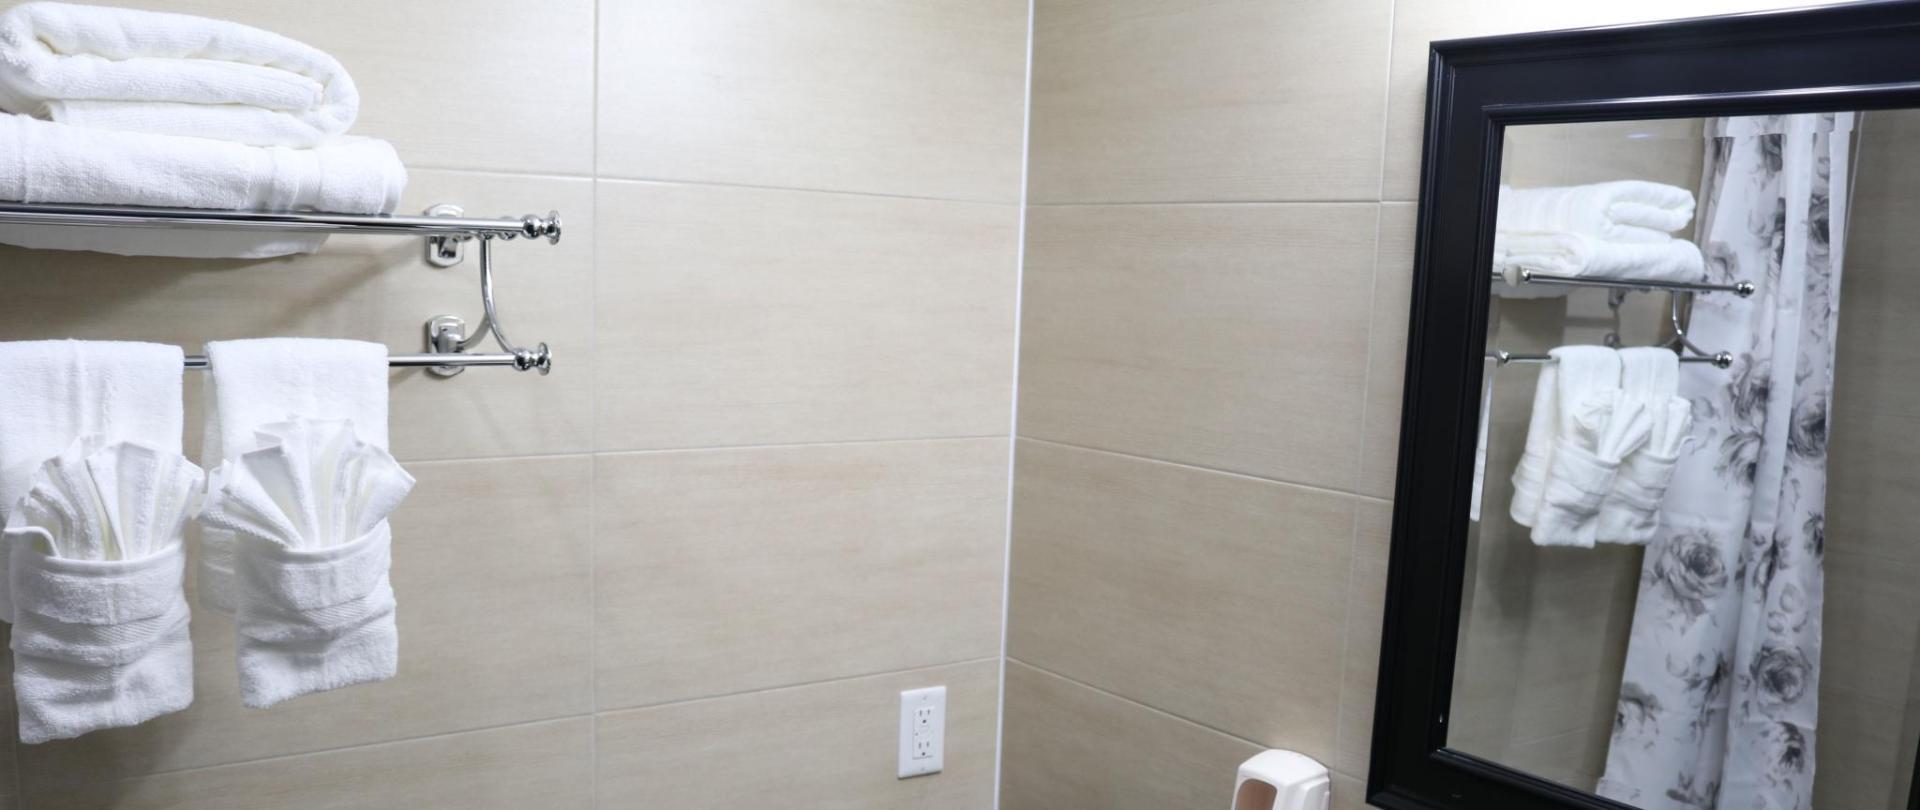 https://www.hotelsbyday.com/_data/default-hotel_image/1/8829/38542571.jpg